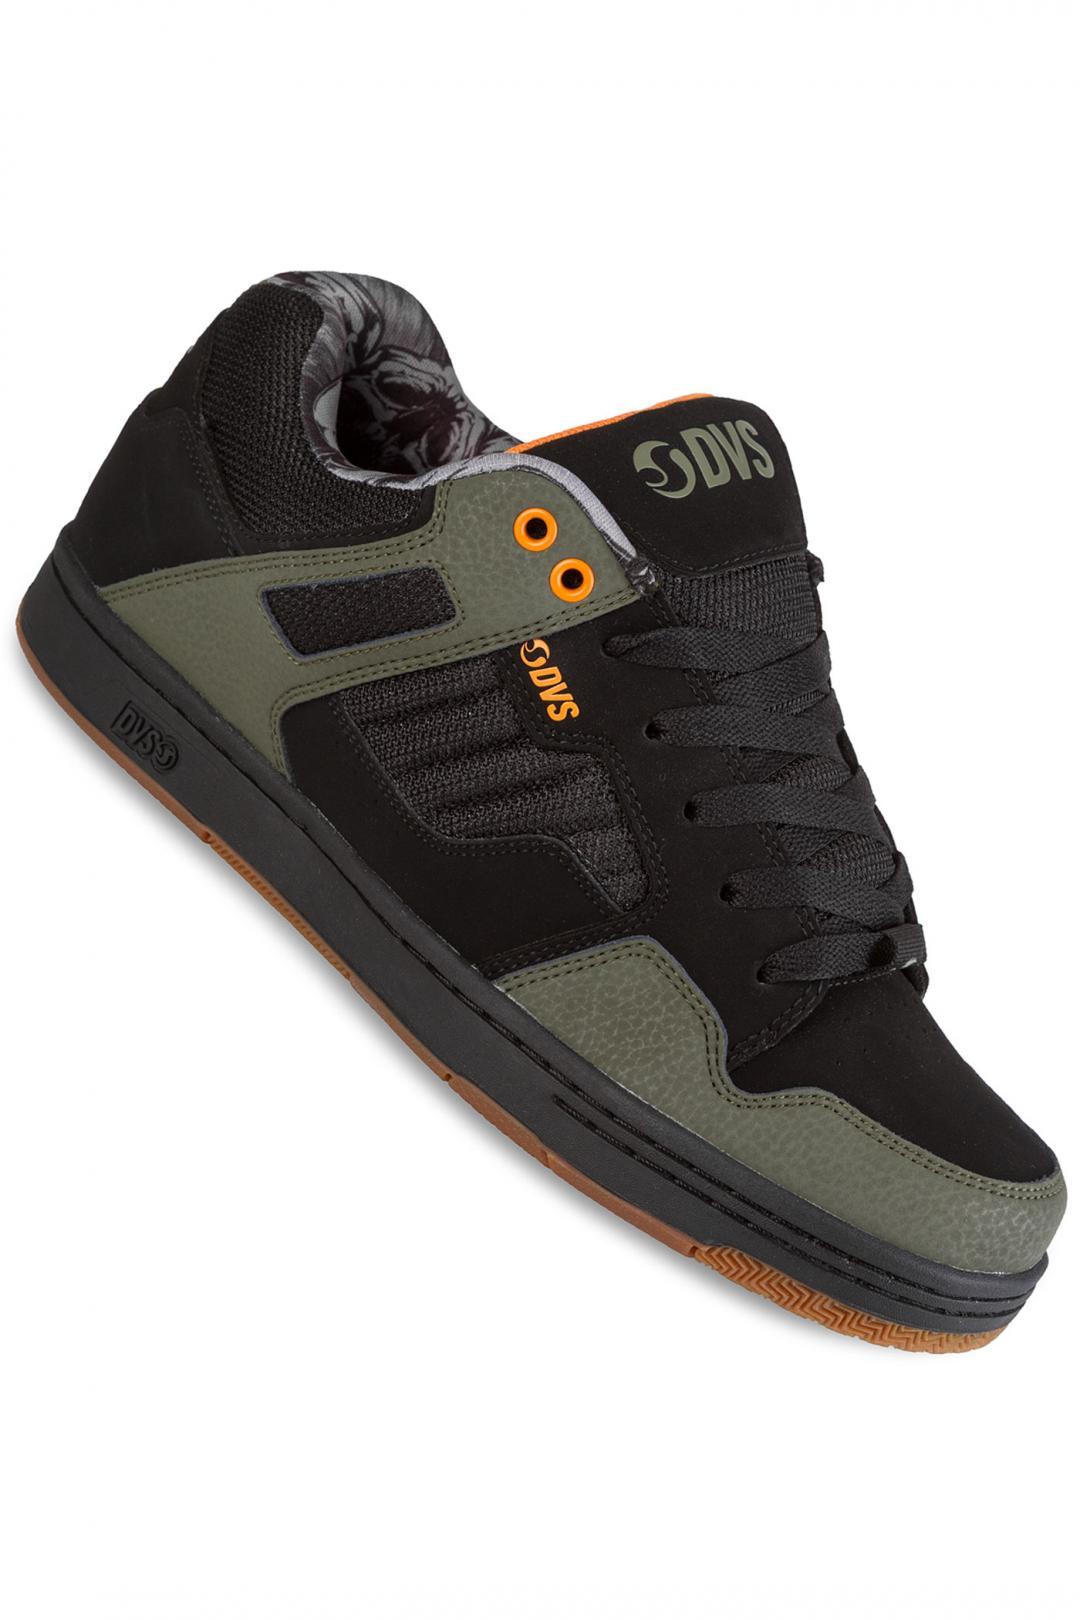 Uomo DVS Enduro 125 black olive deegan | Sneaker